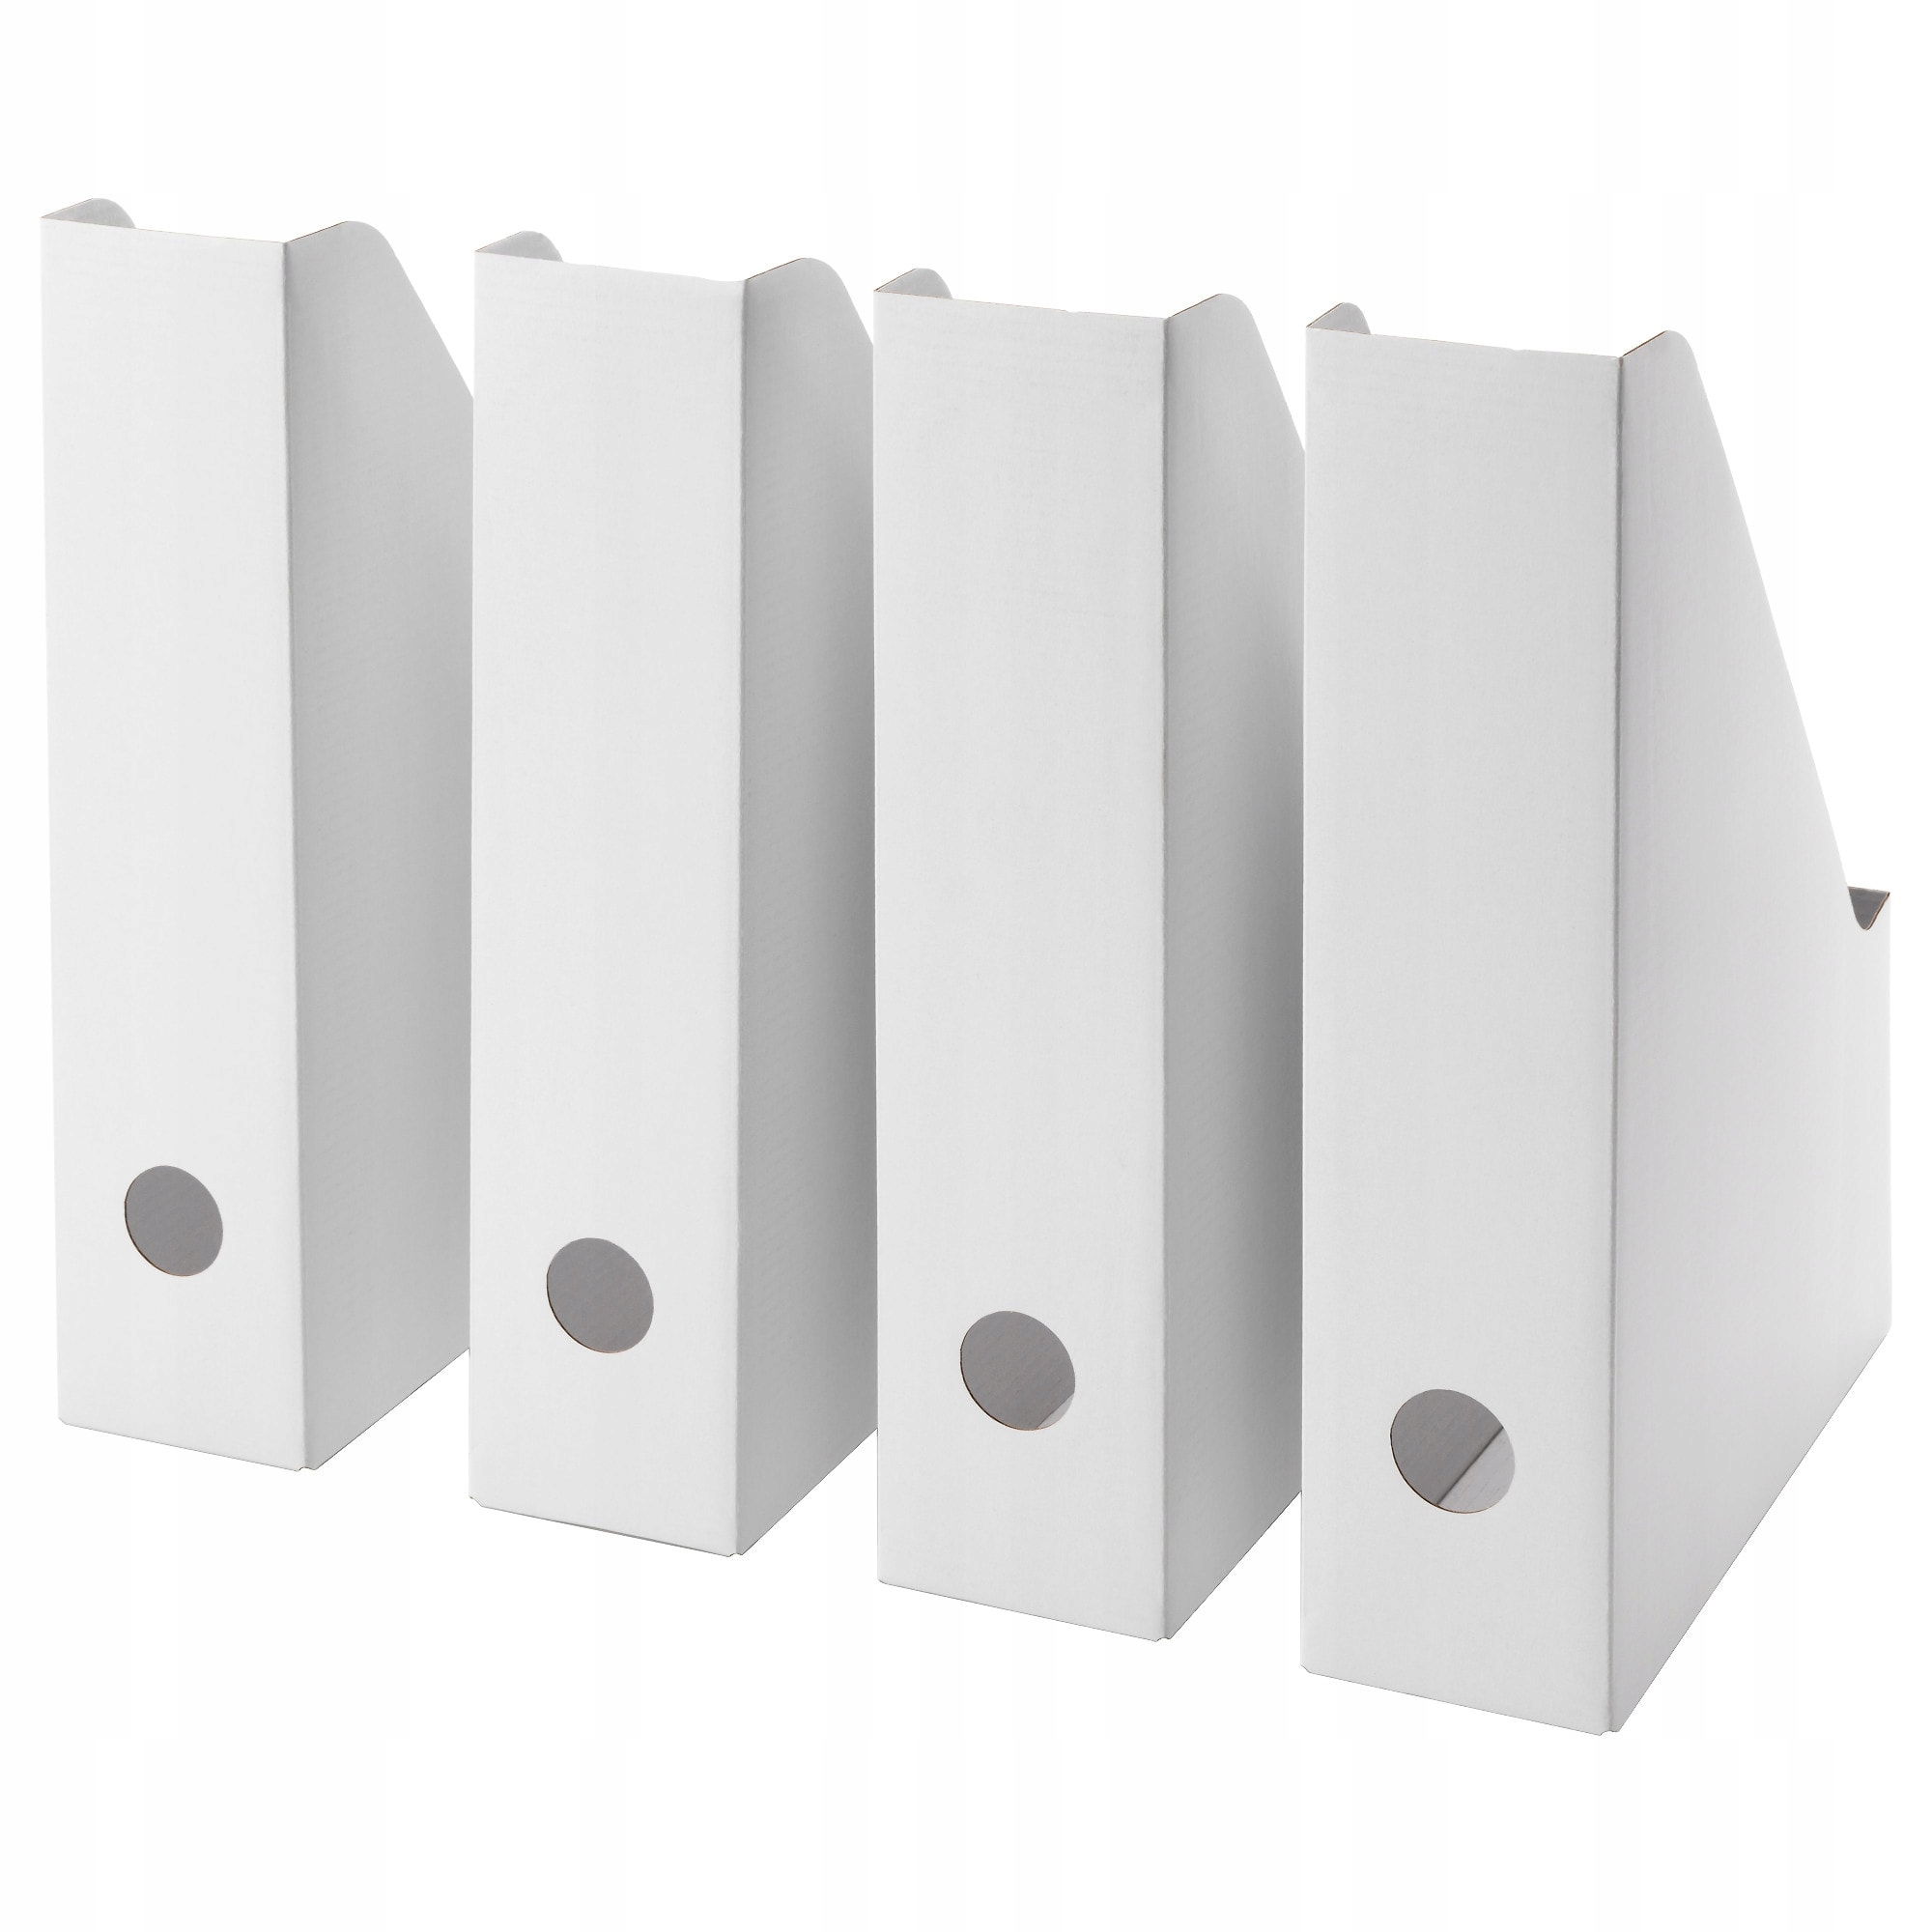 Item IKEA FLUNS BOX FOR DOCUMENT organizer 4pcs